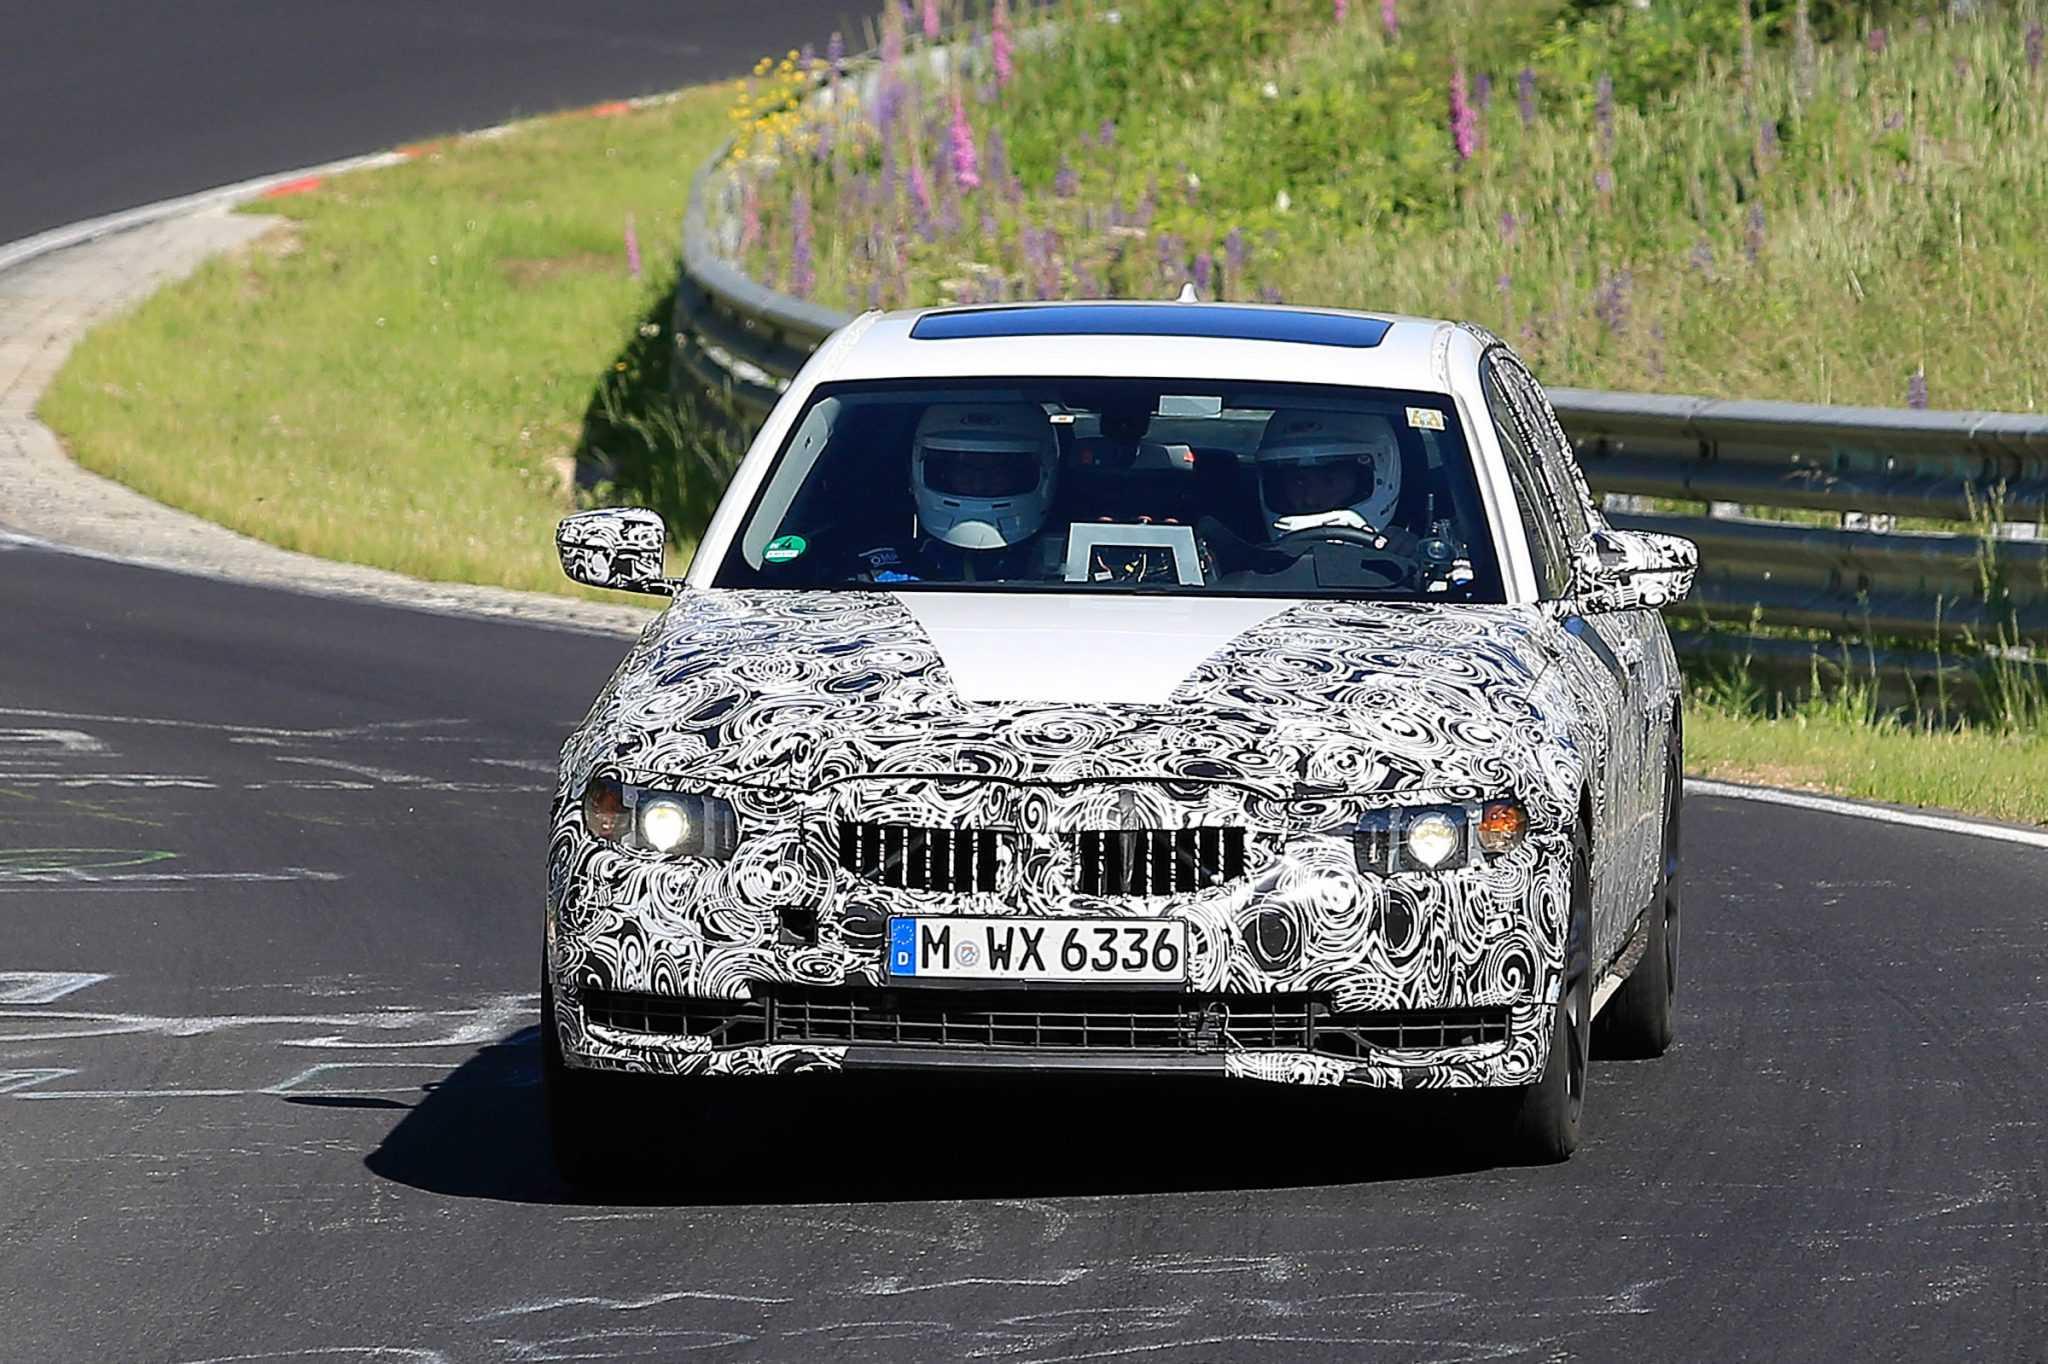 2018 BMW 3 Series Spy Shots Emerge Online